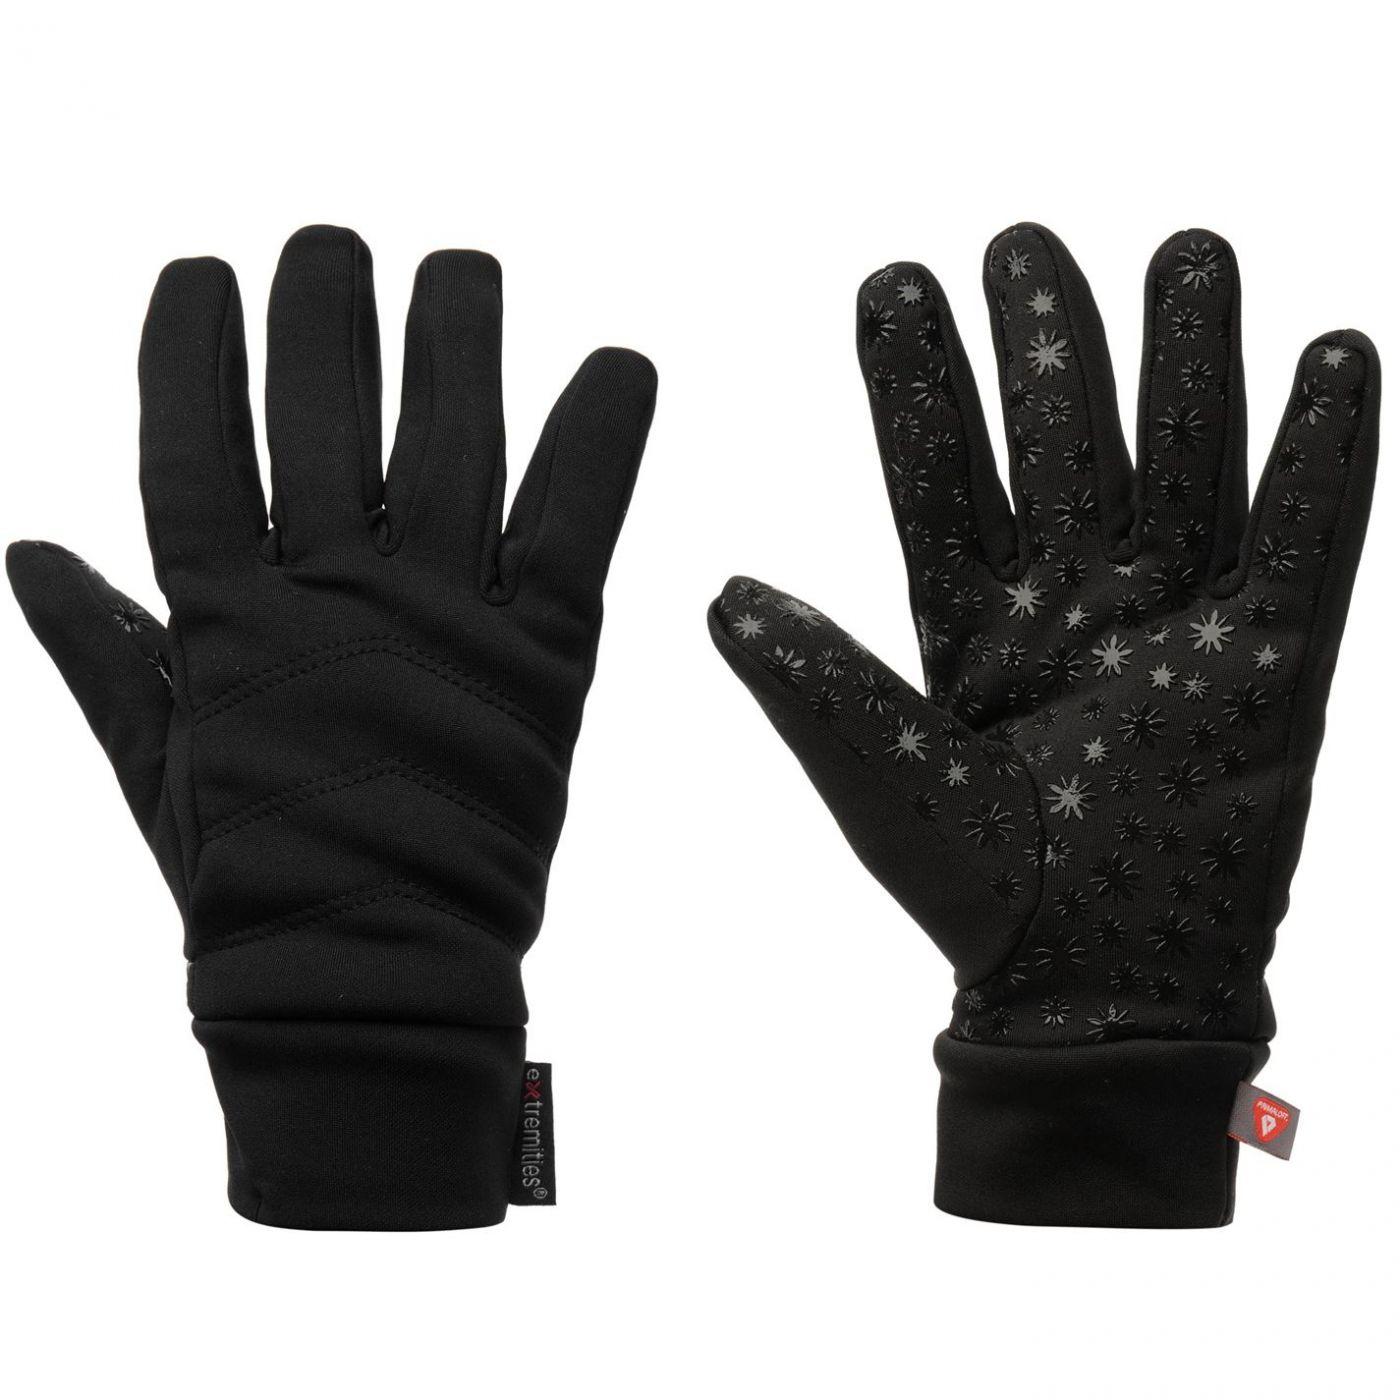 Extremities Knit Gloves Junior